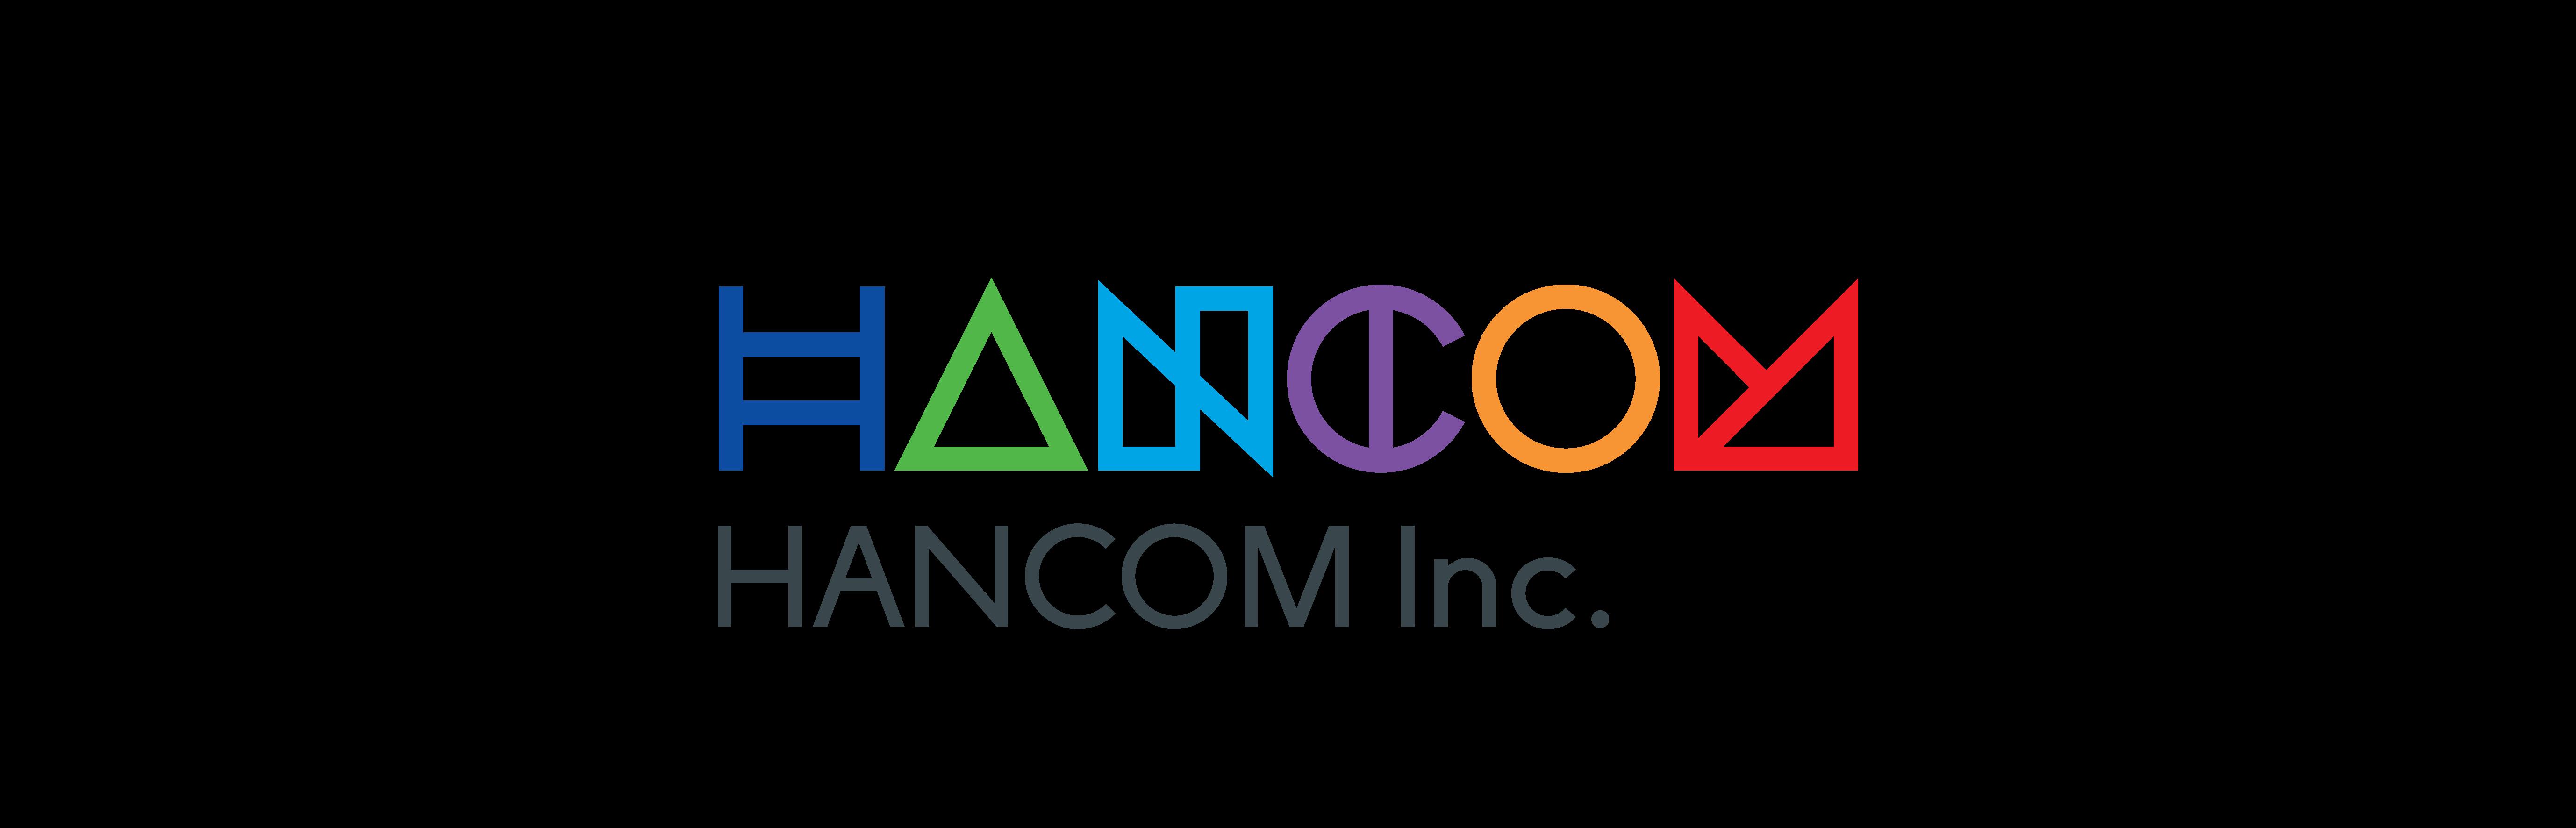 Hancom logo 2